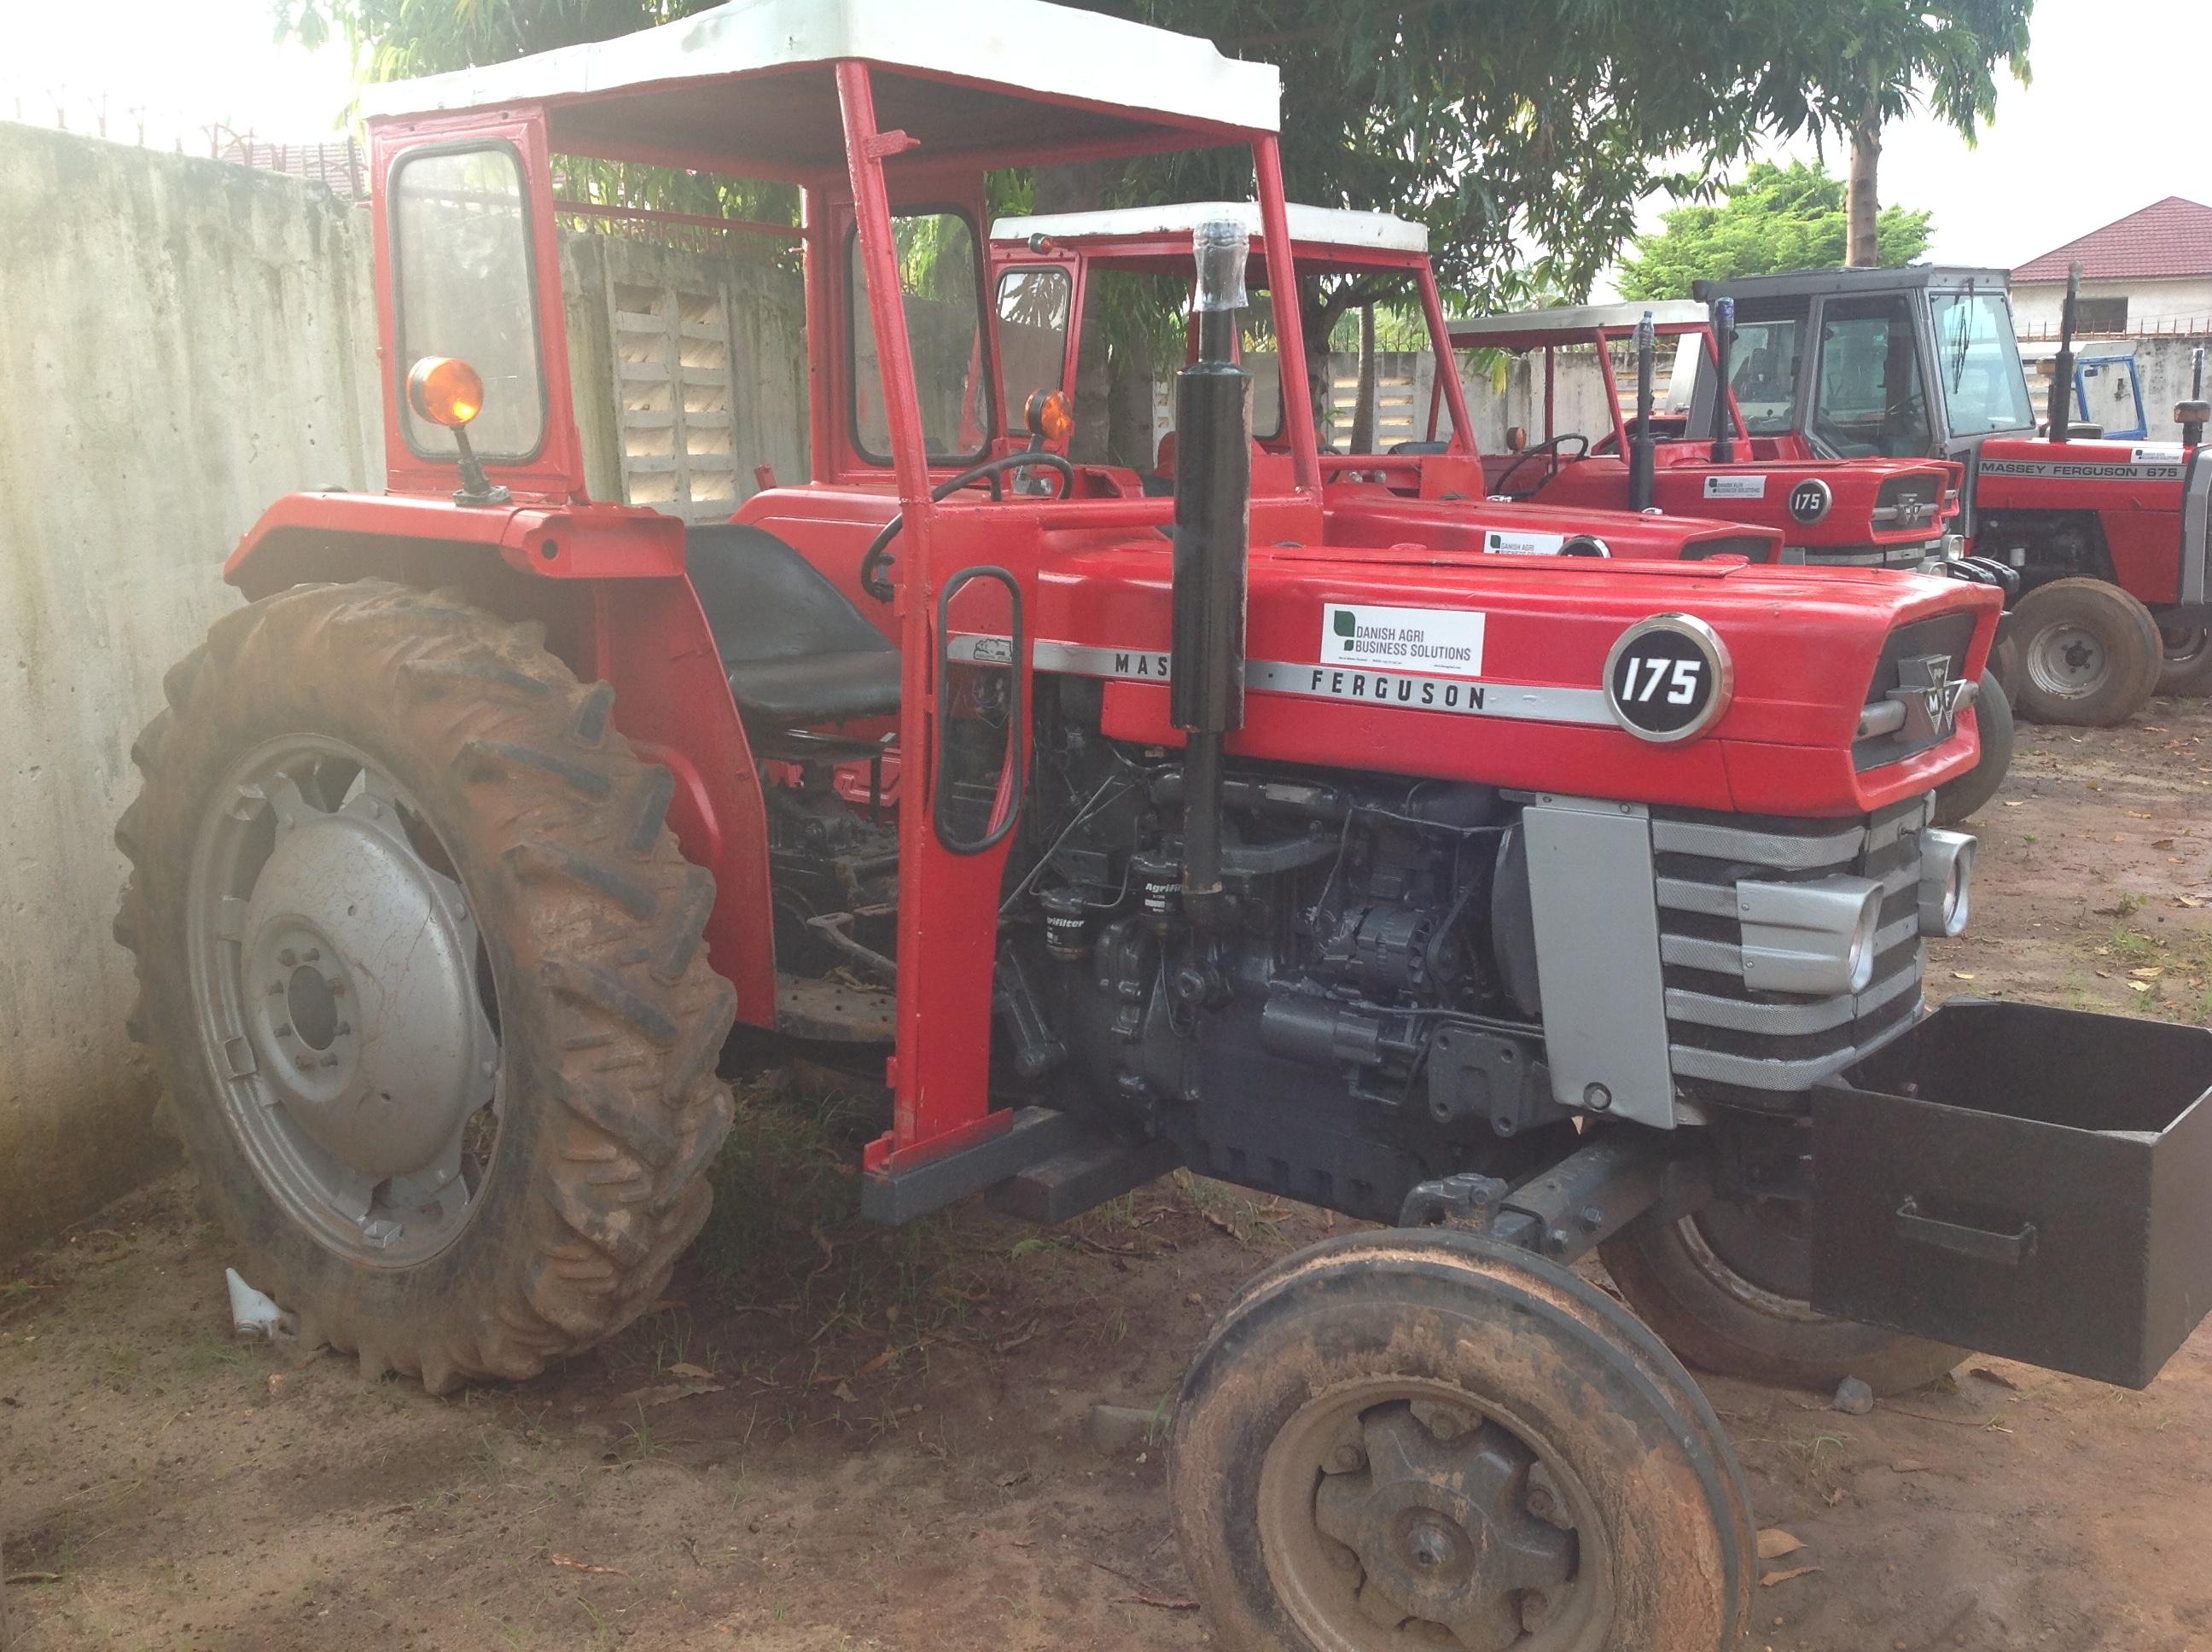 Massey Ferguson 175 Tractor Data : Used massey ferguson tractors tanzania